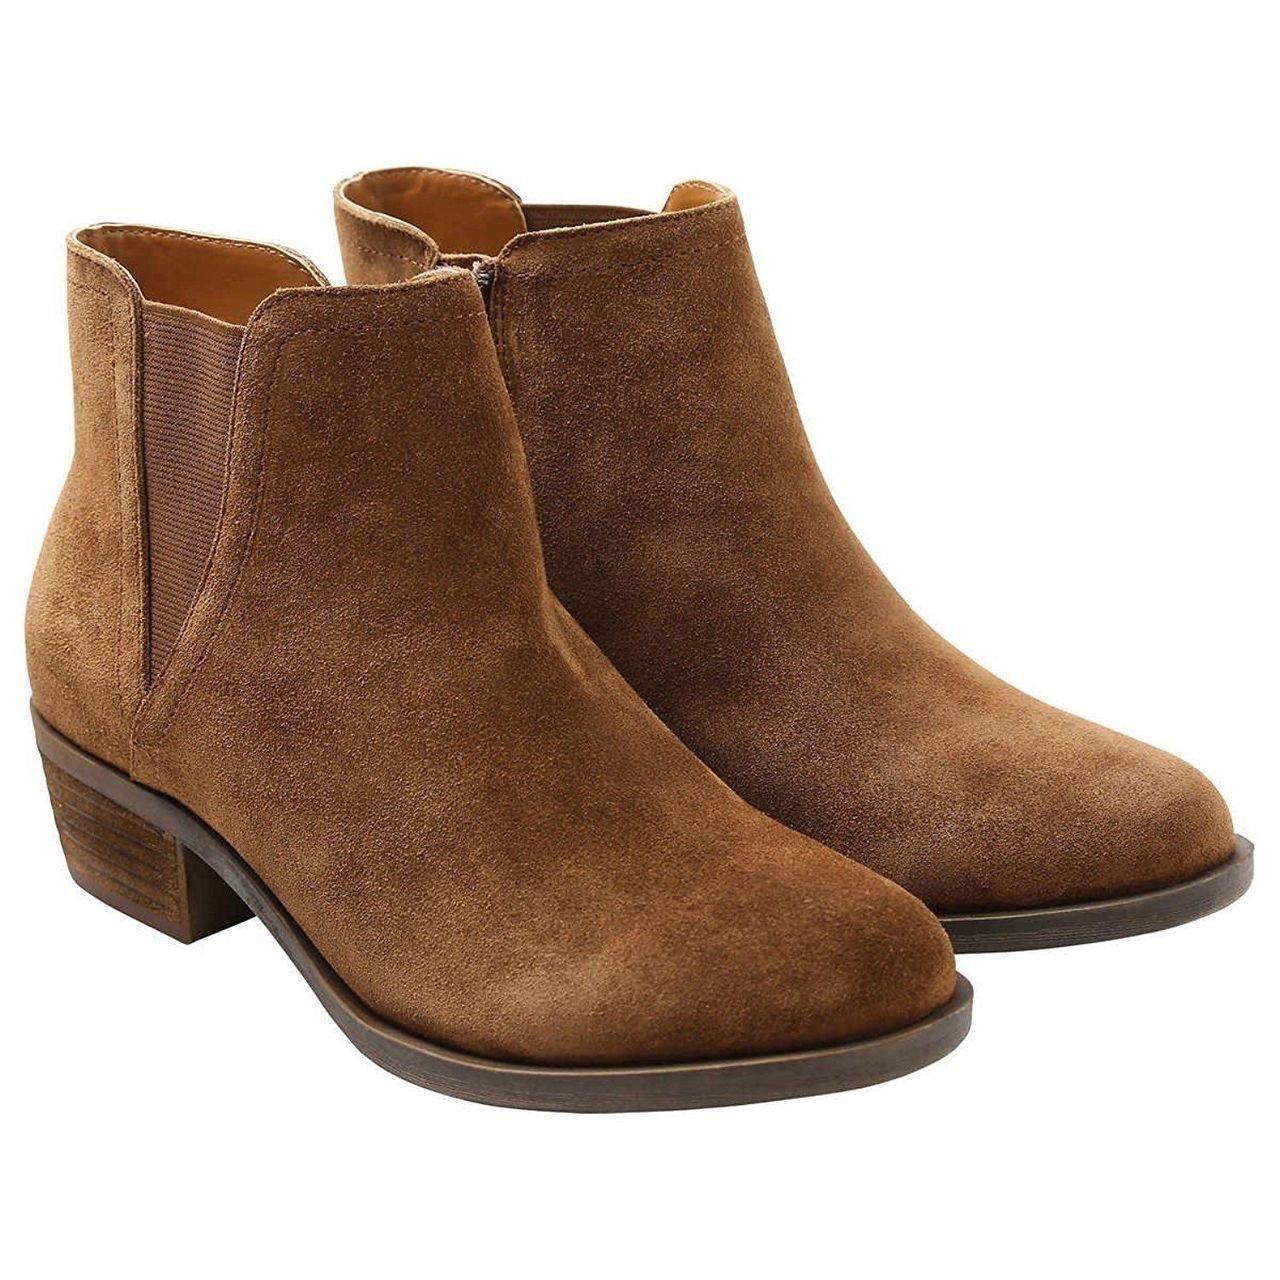 kensie Womens Garrett (Garry) Ankle Boots-Brown B01MR51J47 7.5 B(M) US